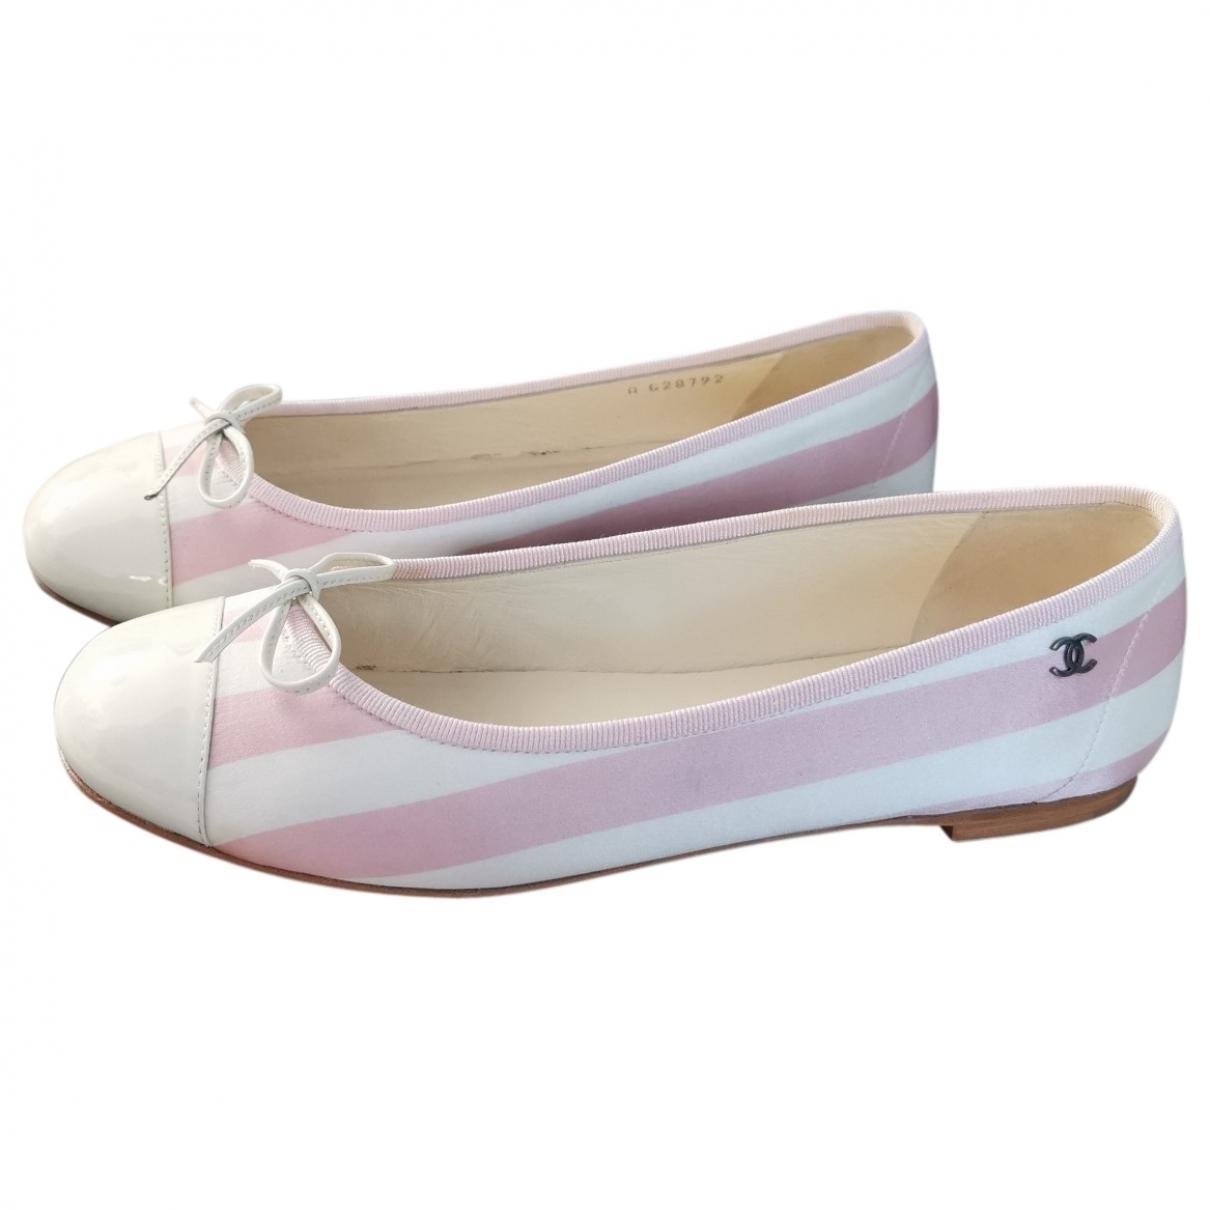 Chanel - Ballerines   pour femme en toile - rose